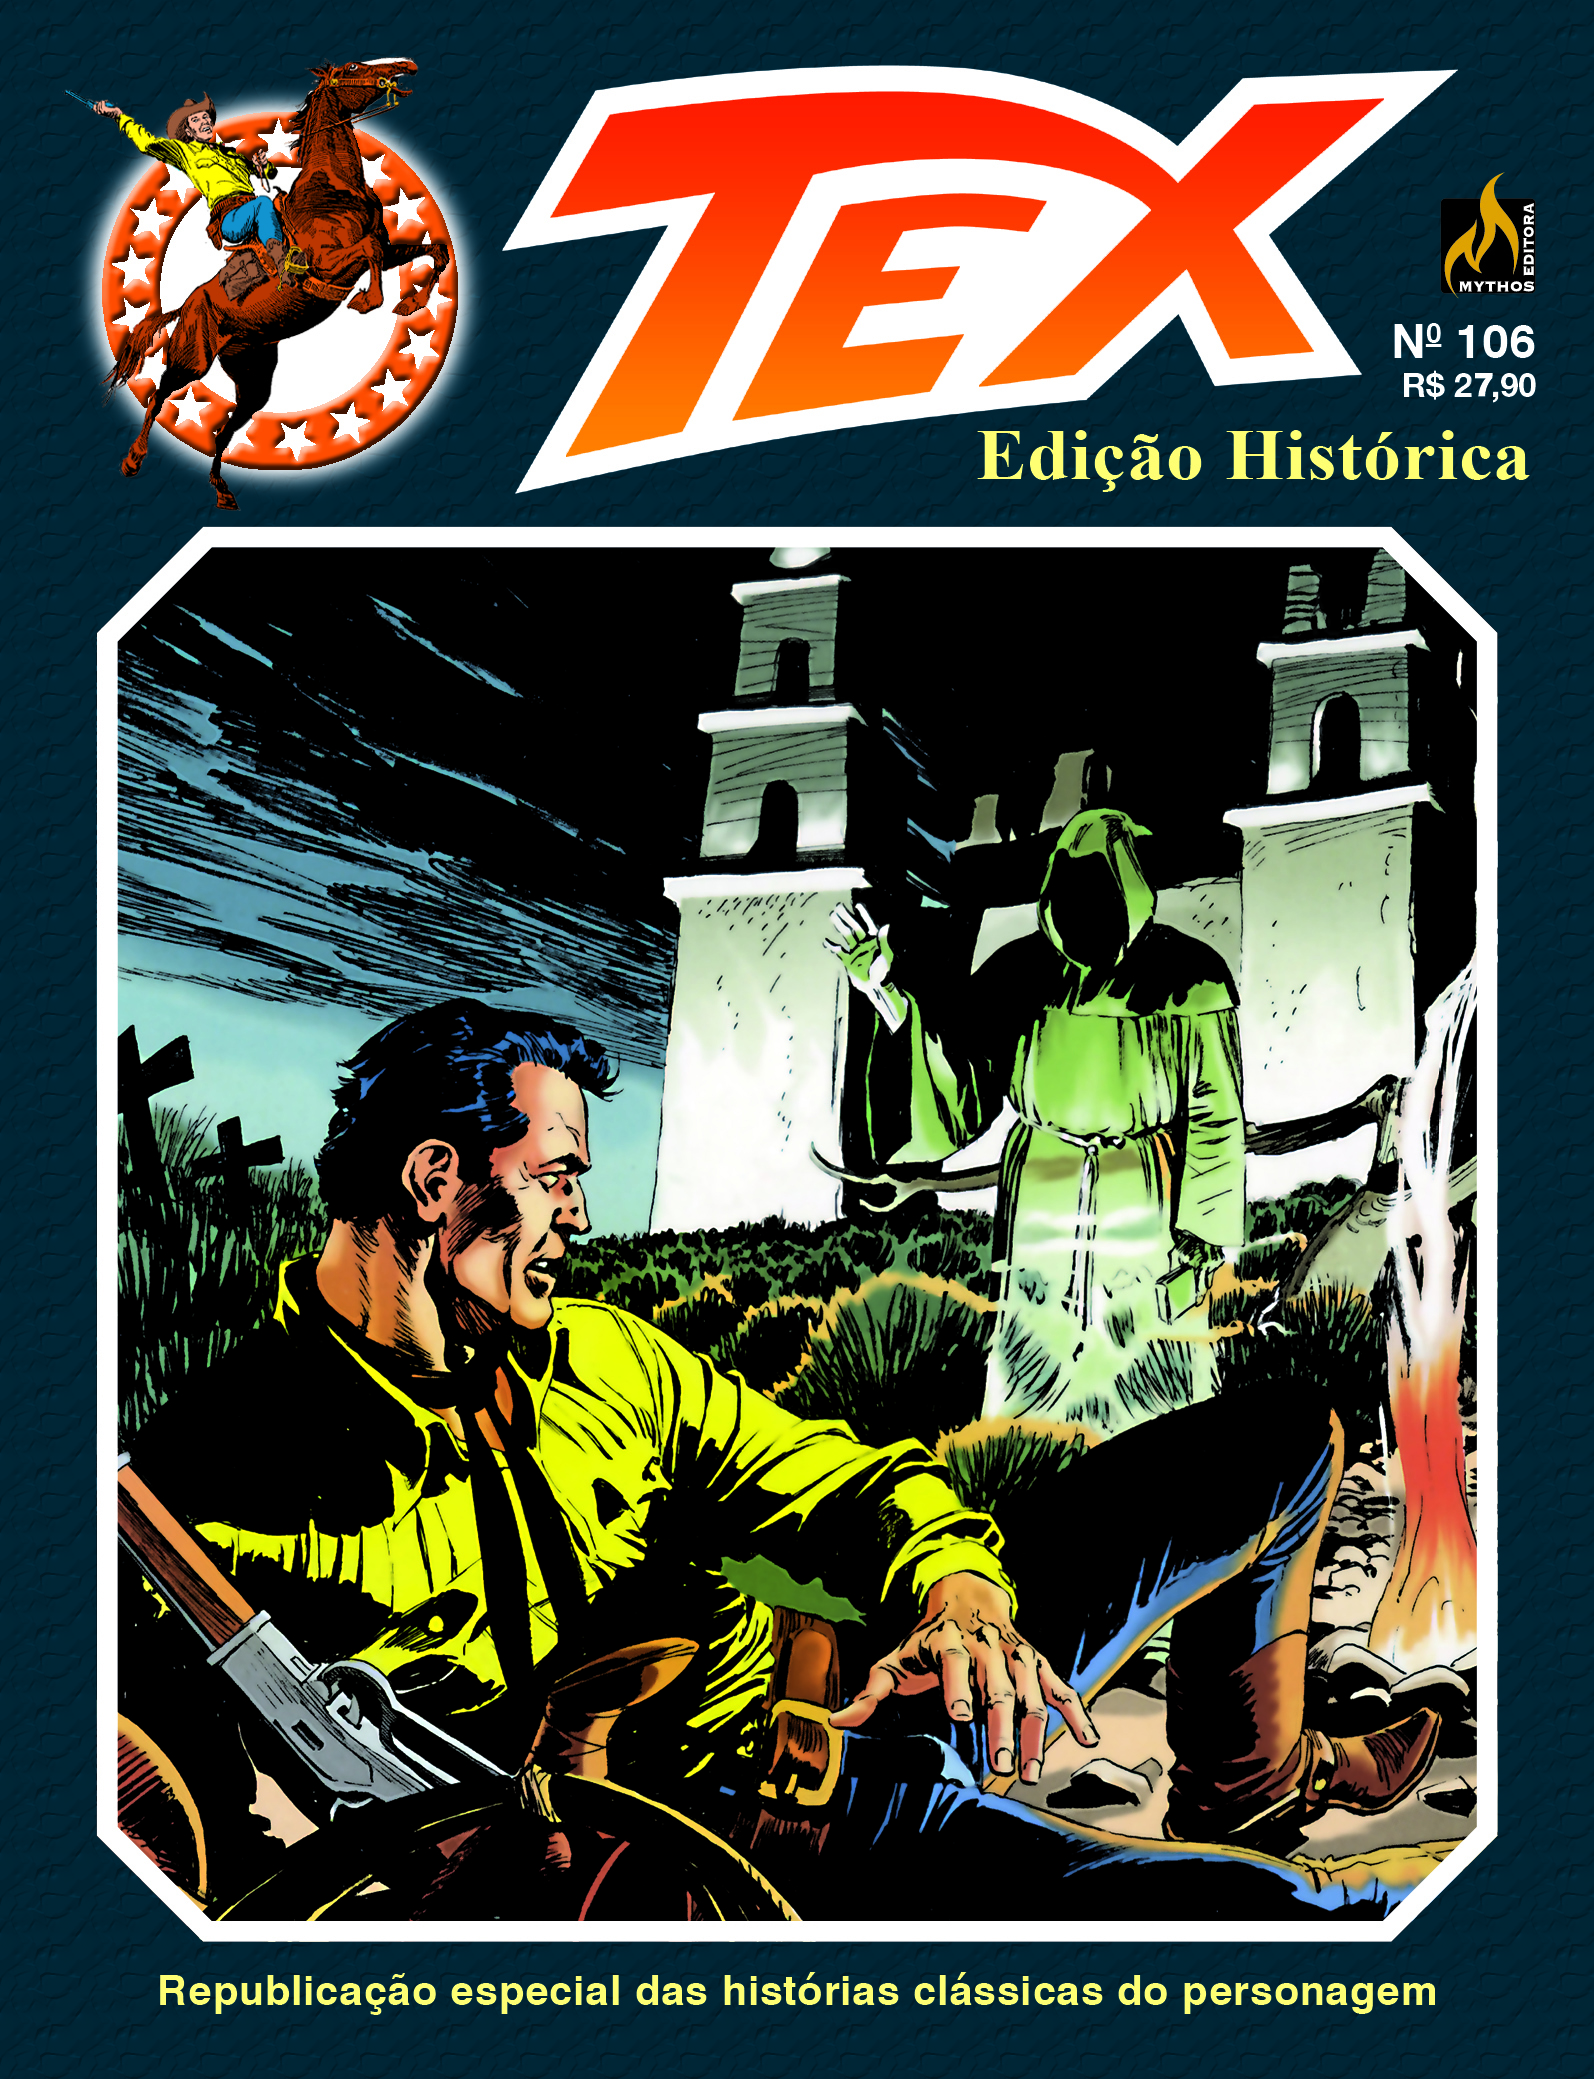 TEX ED HISTORICA Nº 106